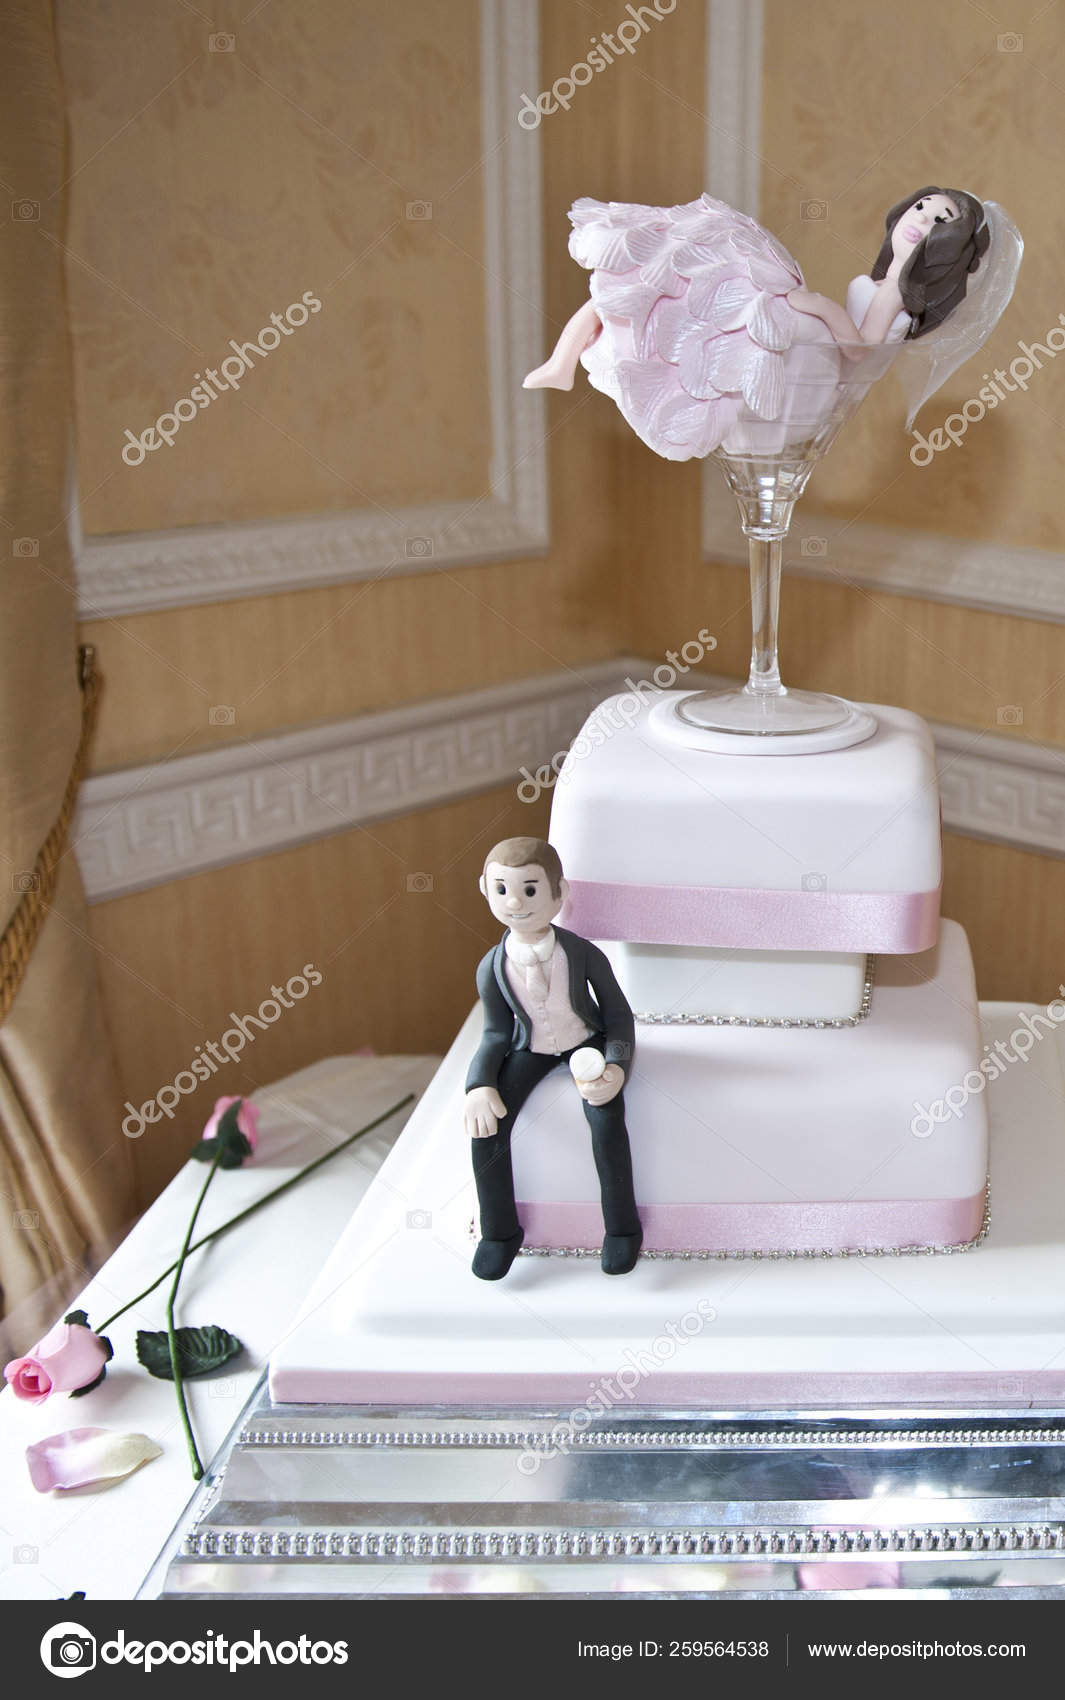 Wedding Cake Models Bride Groom Stock Photo Image By C Yayimages 259564538